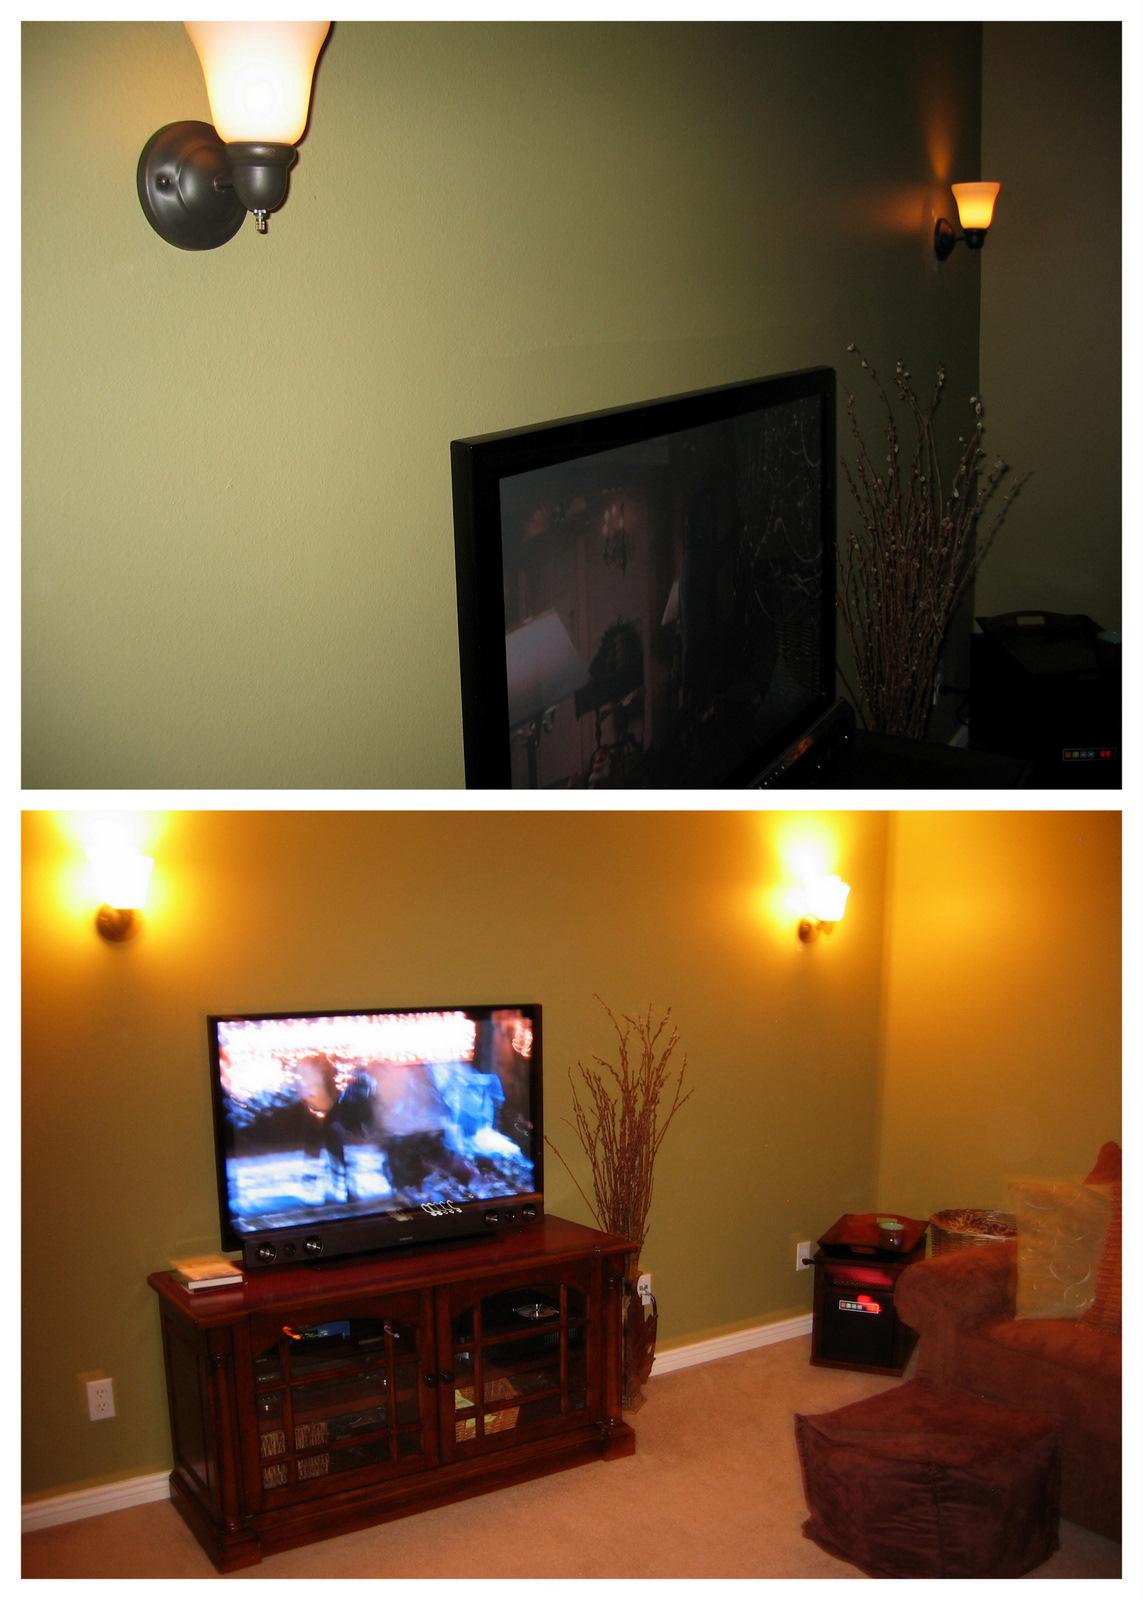 Pink Cookies with Sprinkles Bedroom turned into TV room